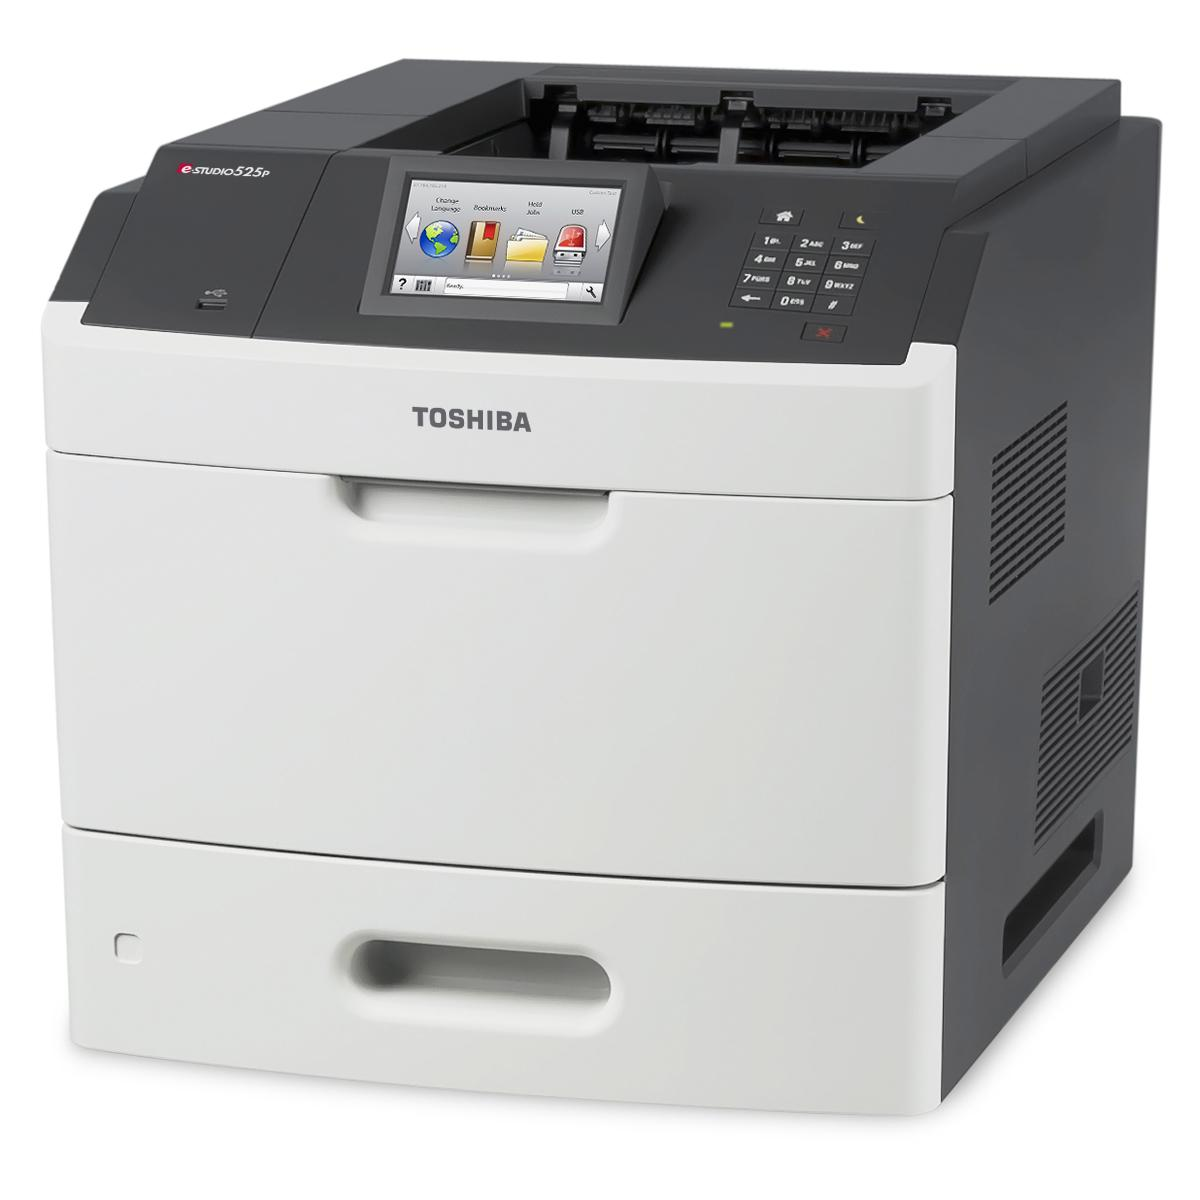 TOSHIBA e-STUDIO 525P A4 Laserskrivare